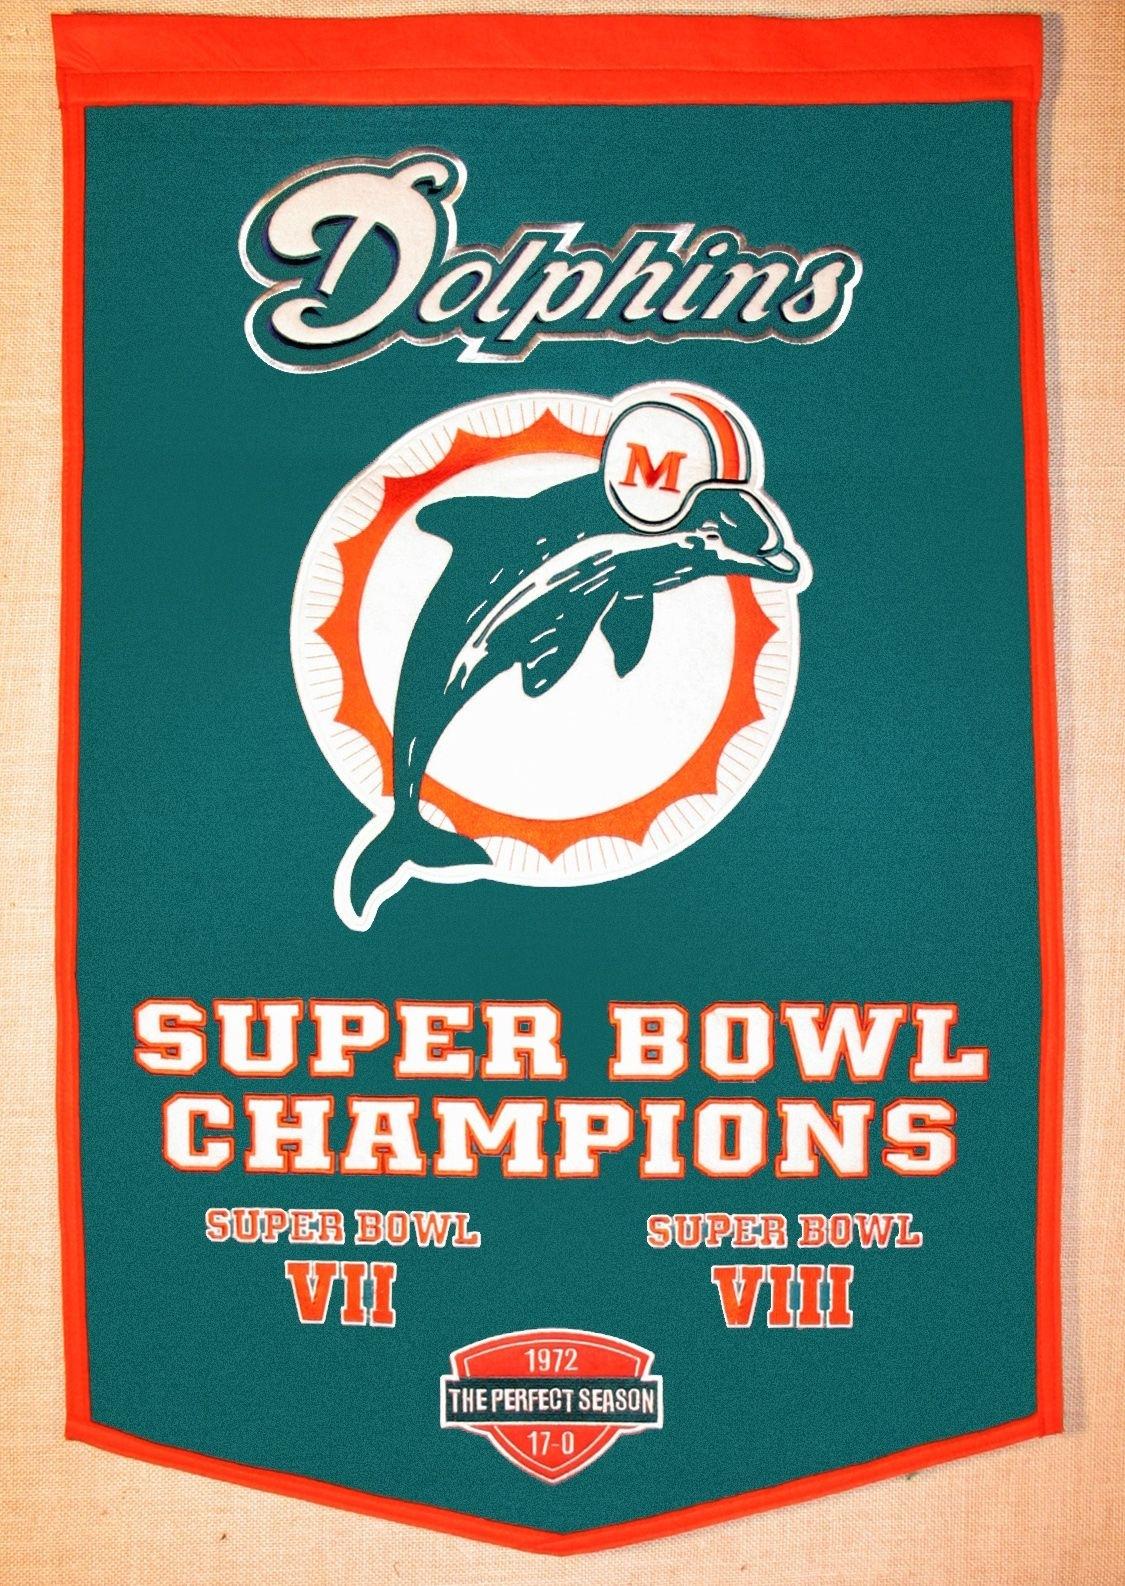 Miami Dolphins Super Bowl Champs | Nfl Miami Dolphins, Miami pertaining to Miami Dolphins Won Super Bowl